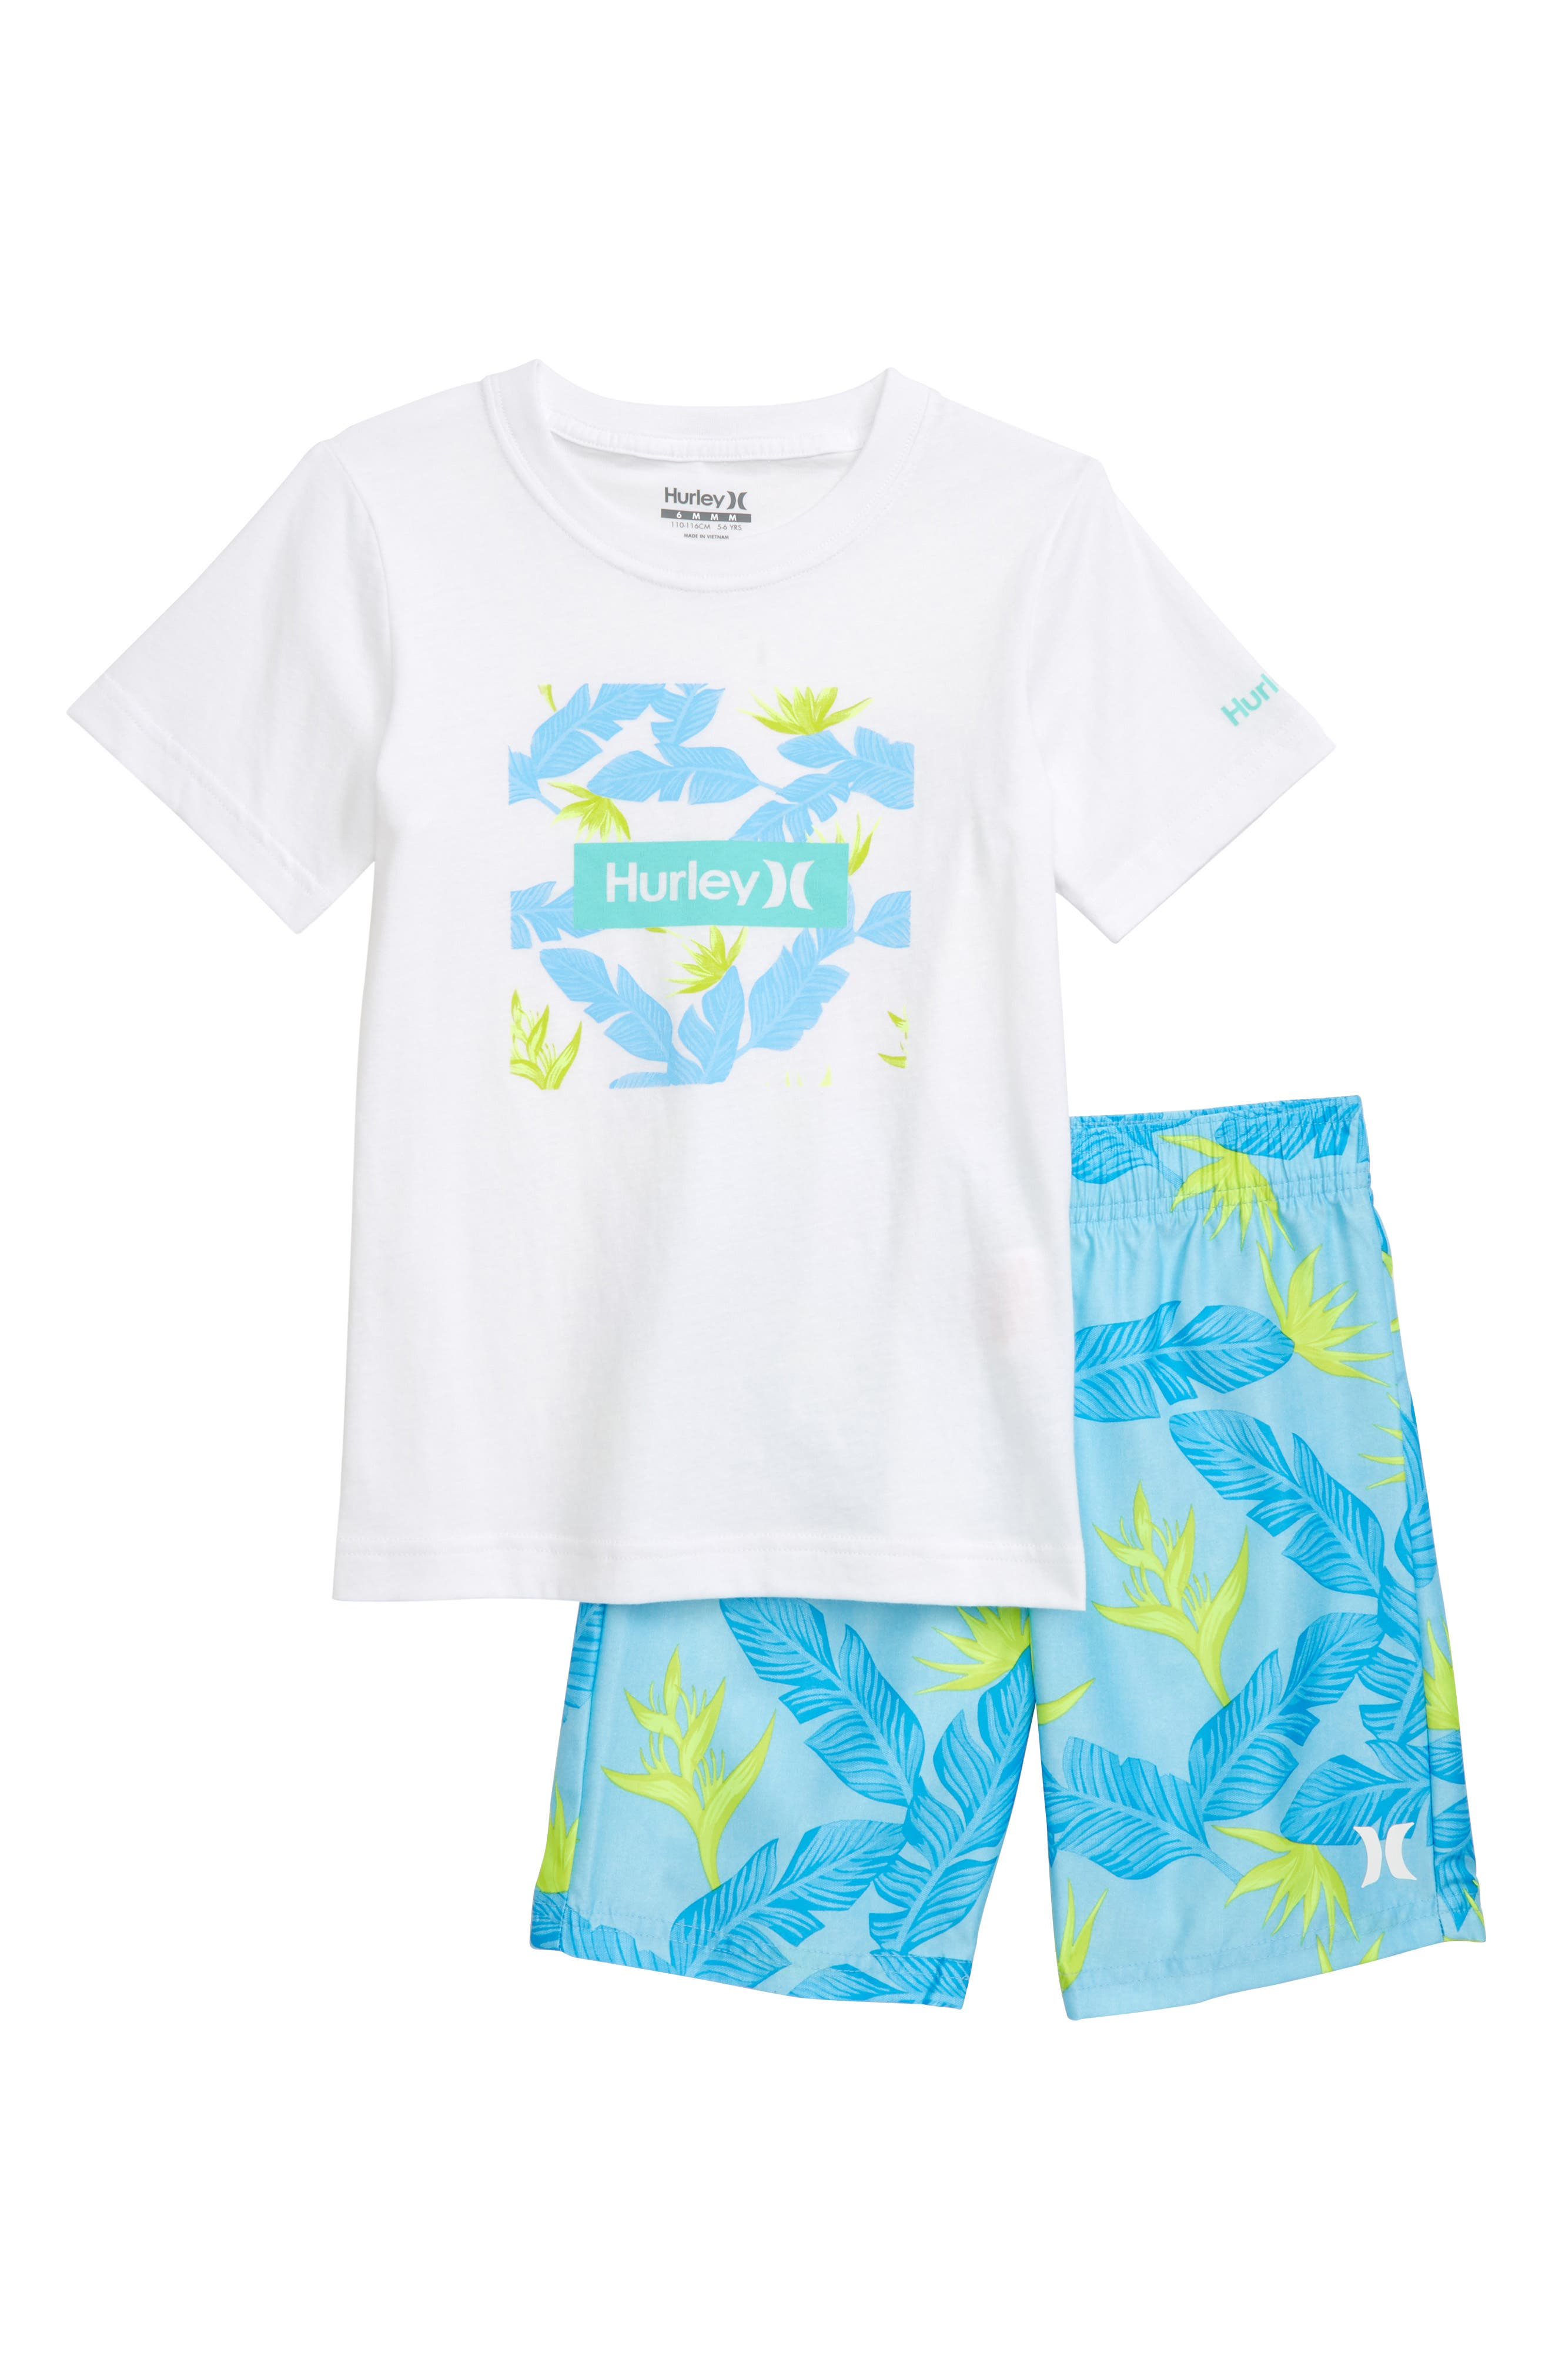 Toddler Boys Hurley Hanoi TShirt  Shorts Set